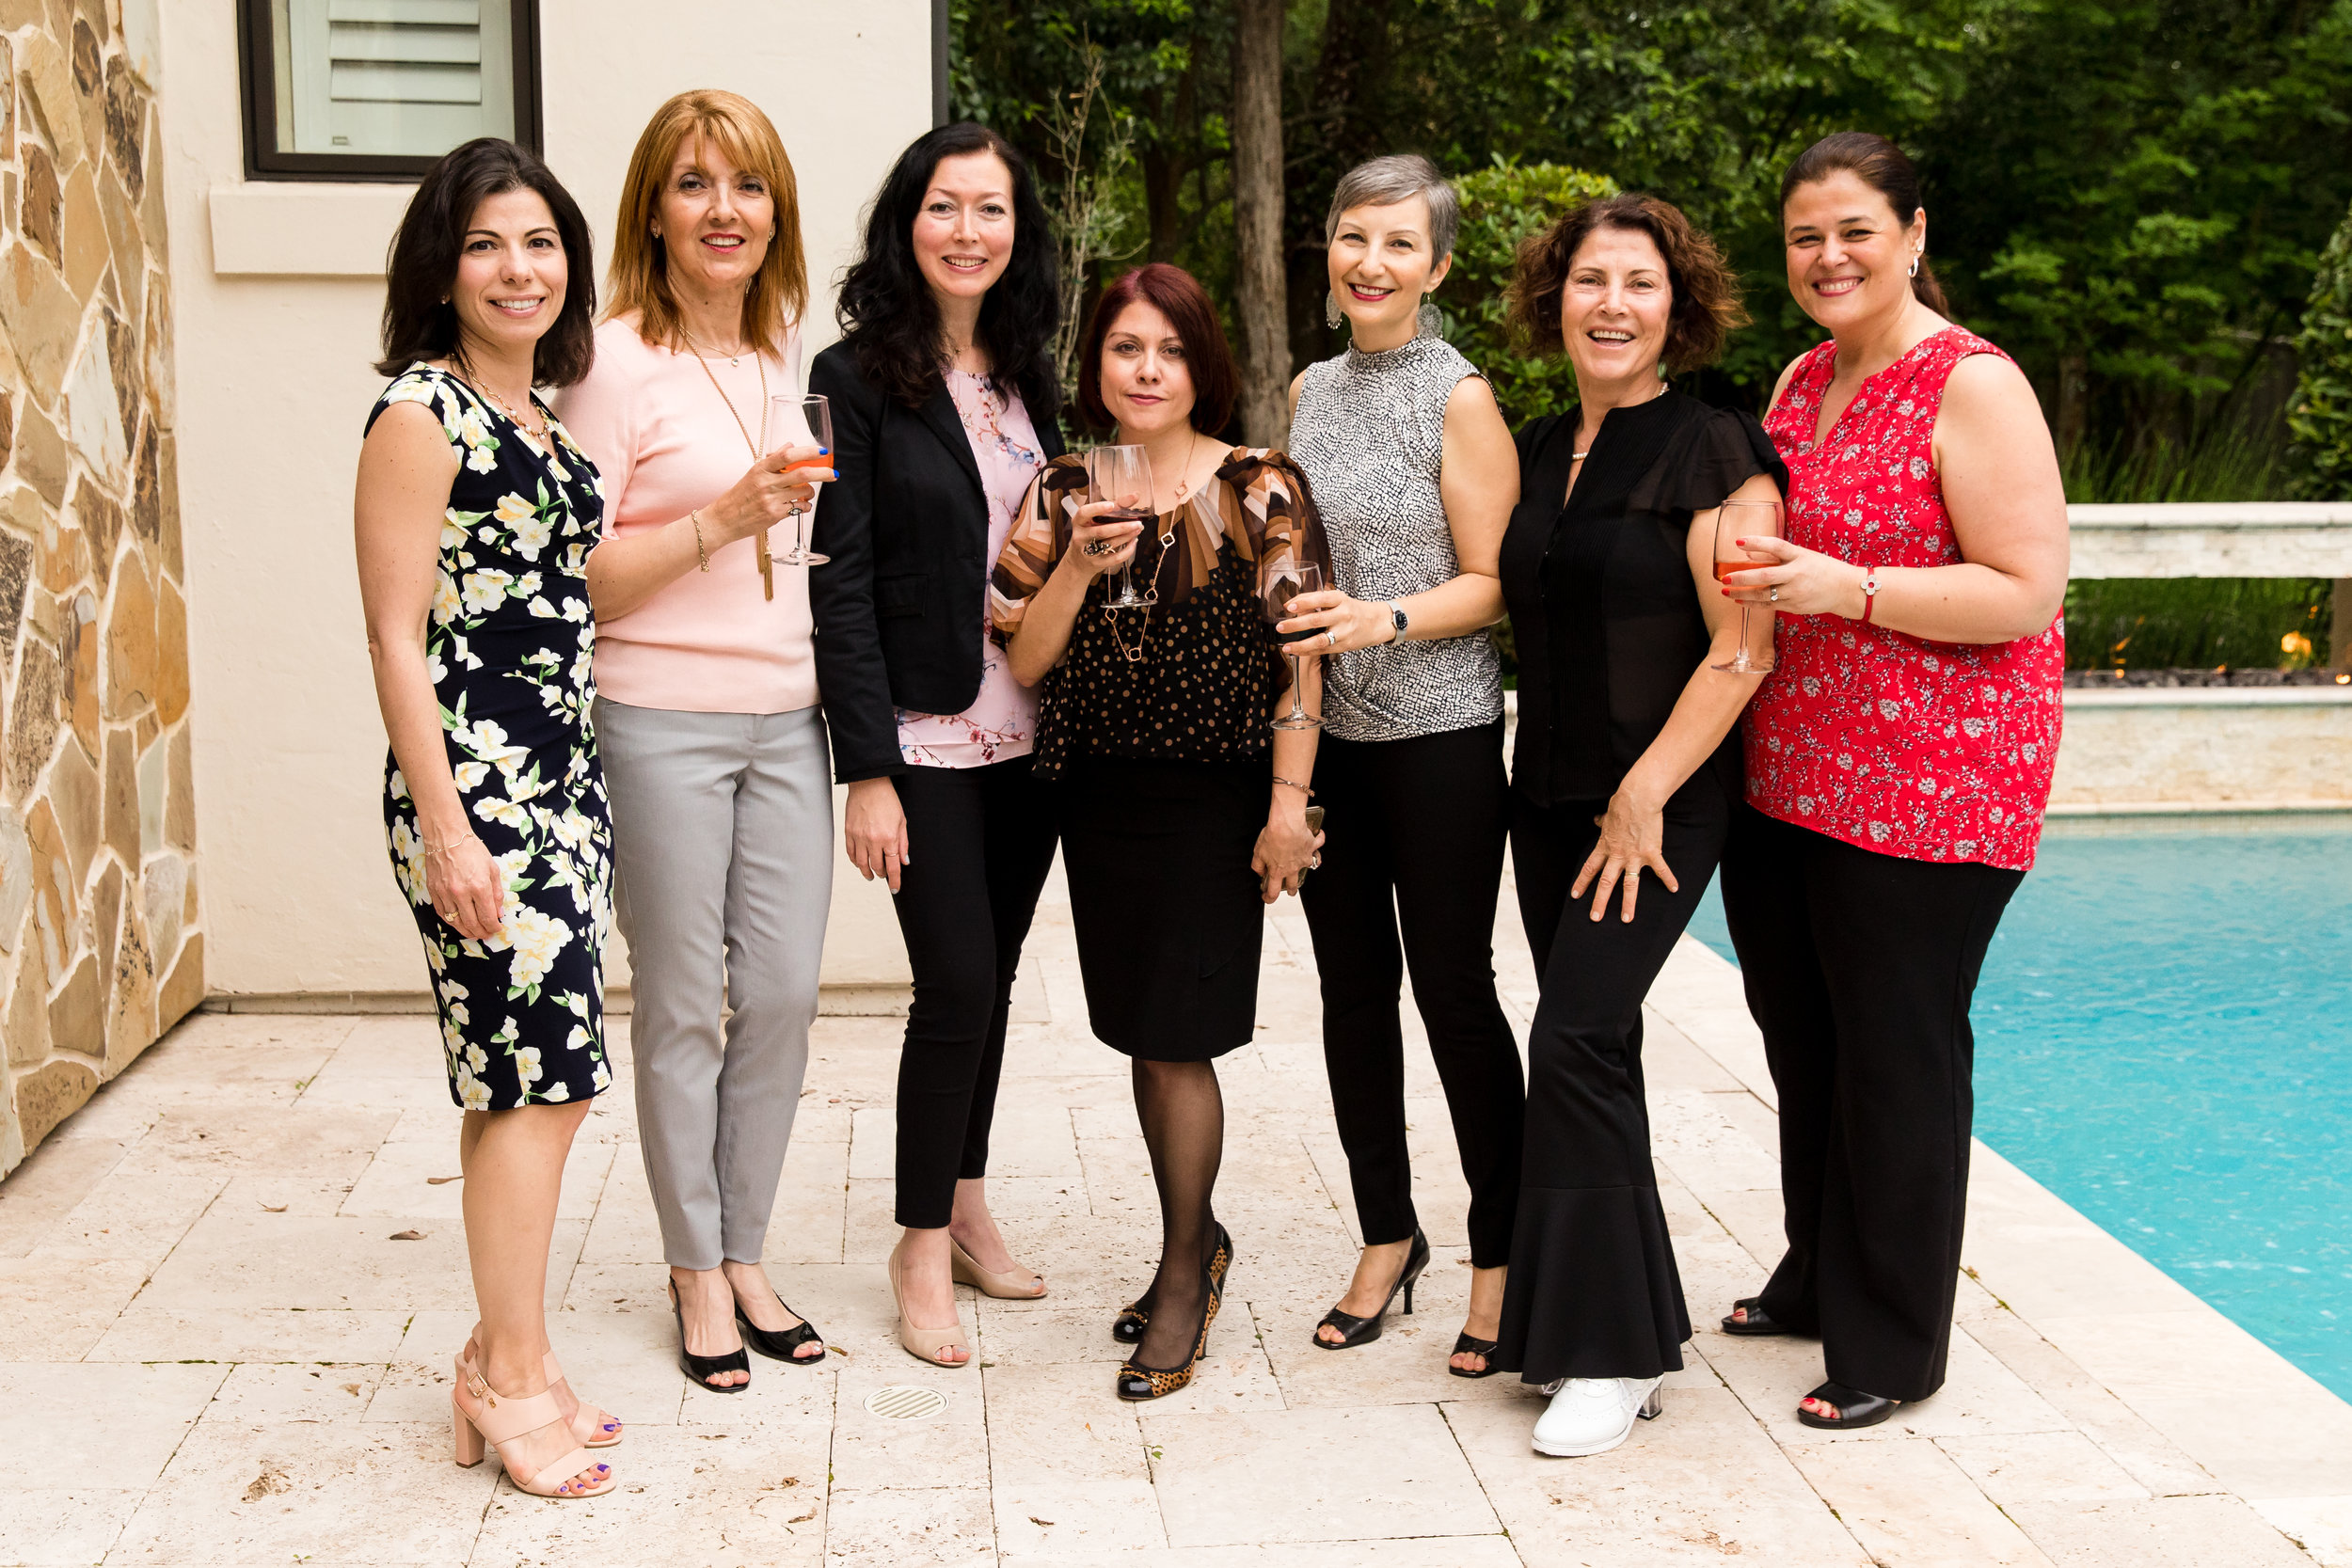 20180421-3rd Annual Education Women Turkey-174.jpg